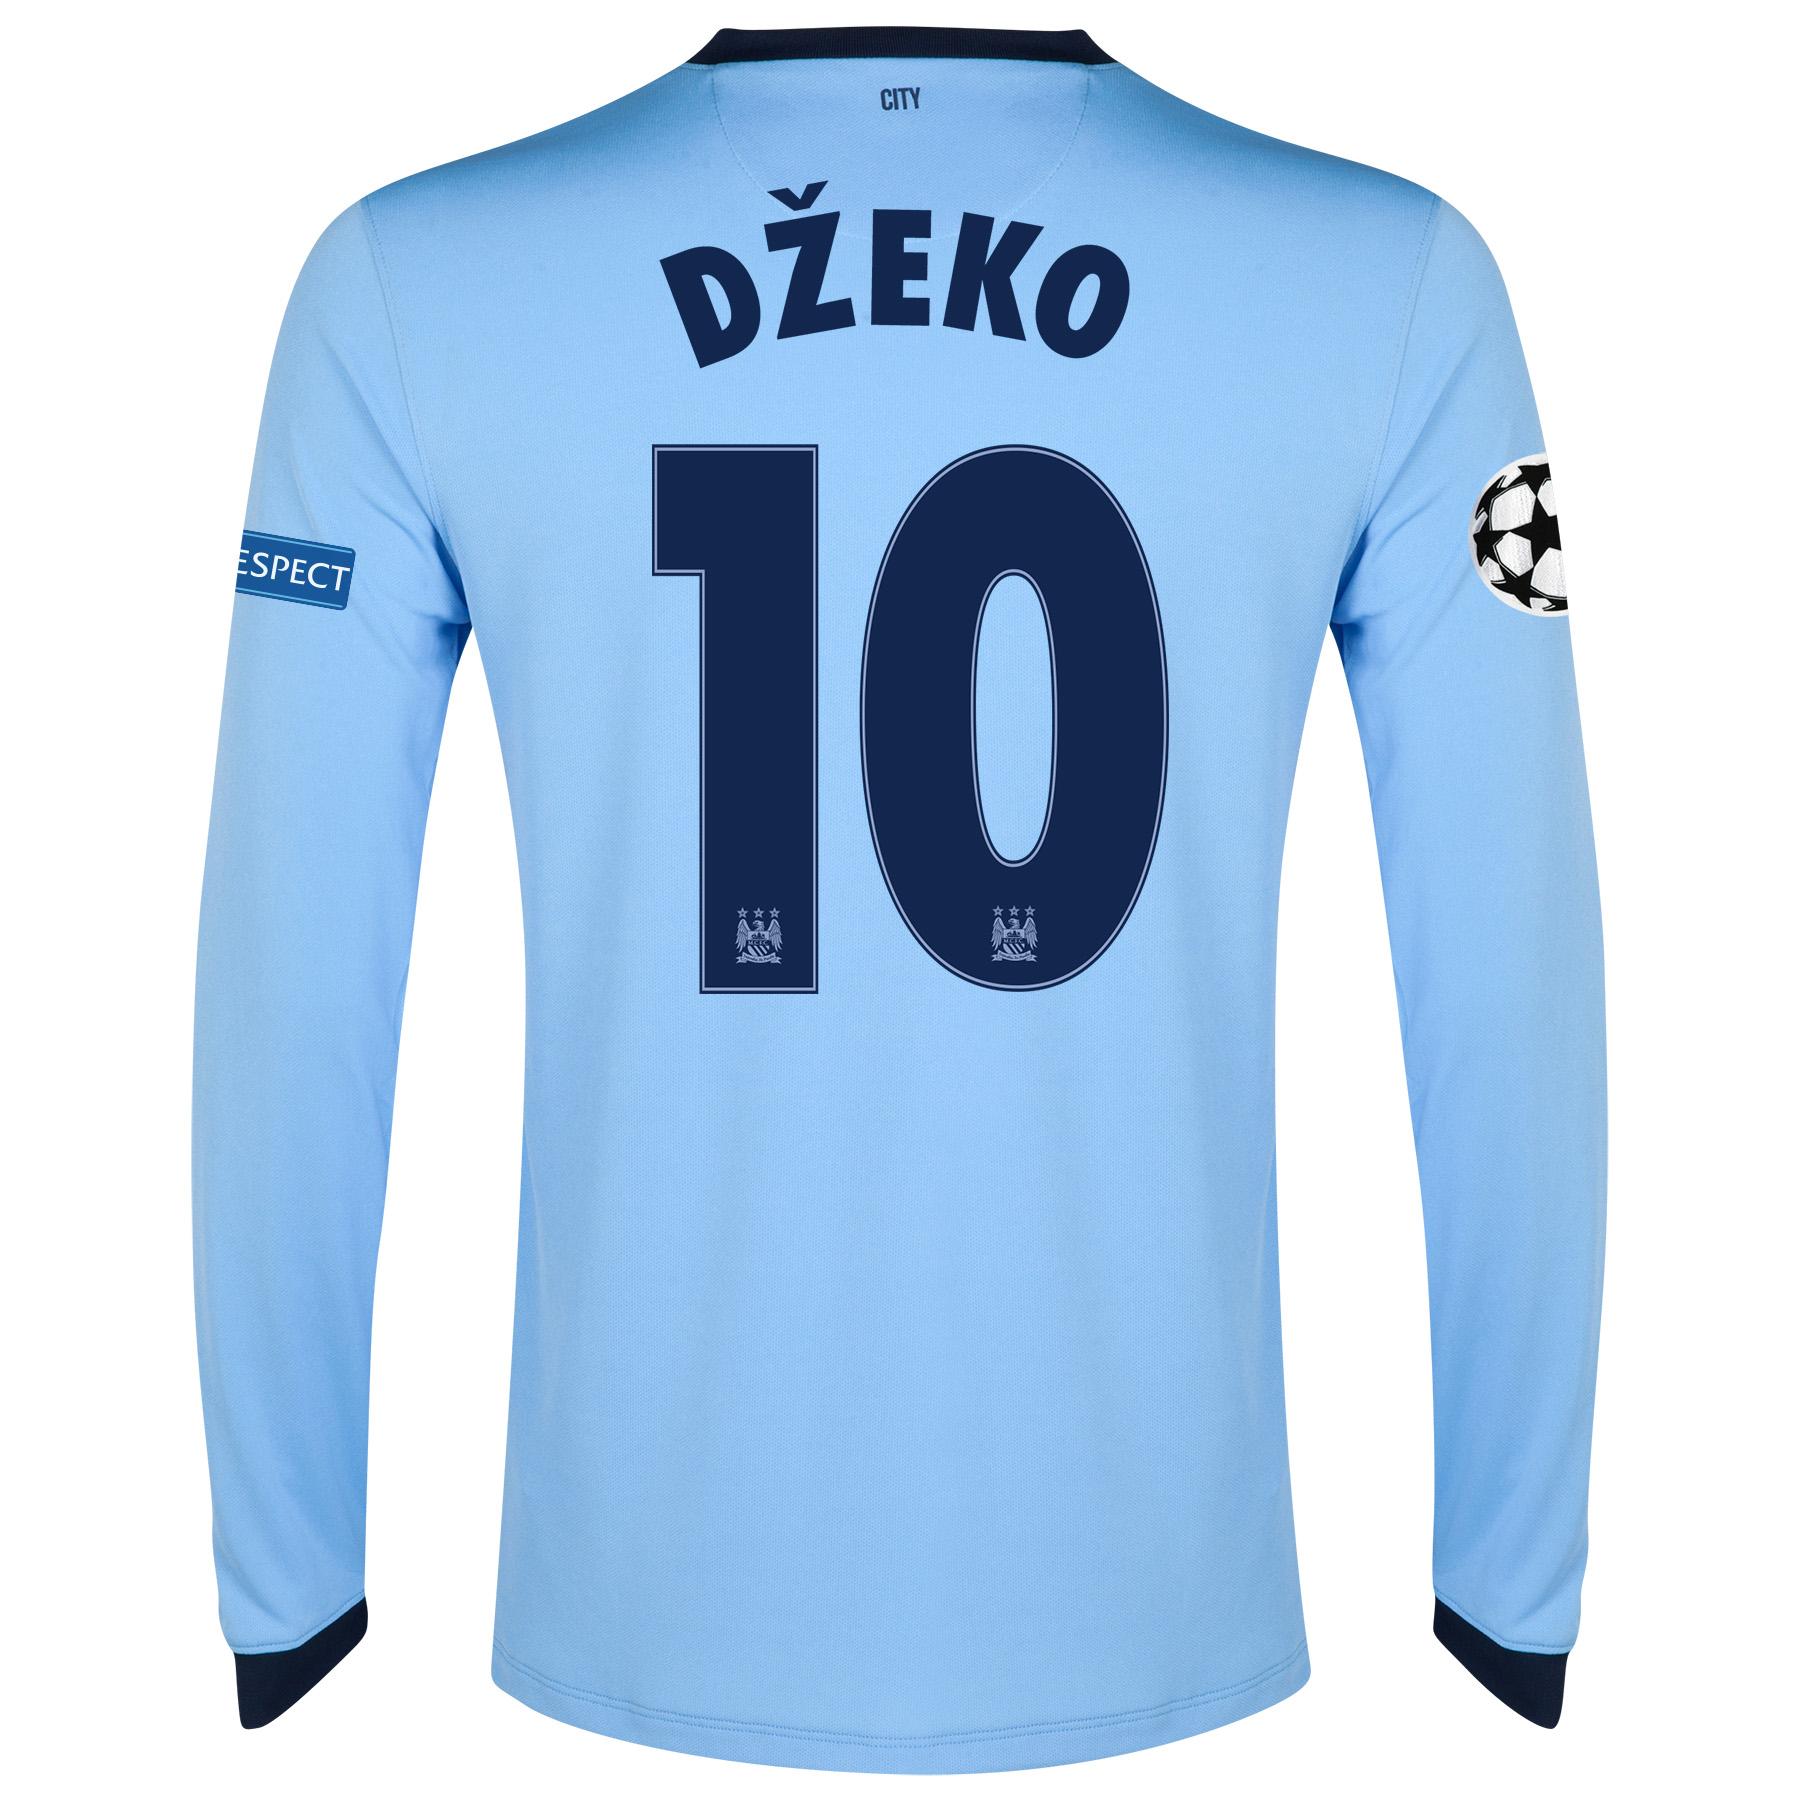 Manchester City UEFA Champions League Home Shirt 2014/15 - Long Sleeve - Kids Sky Blue with Dzeko 10 printing